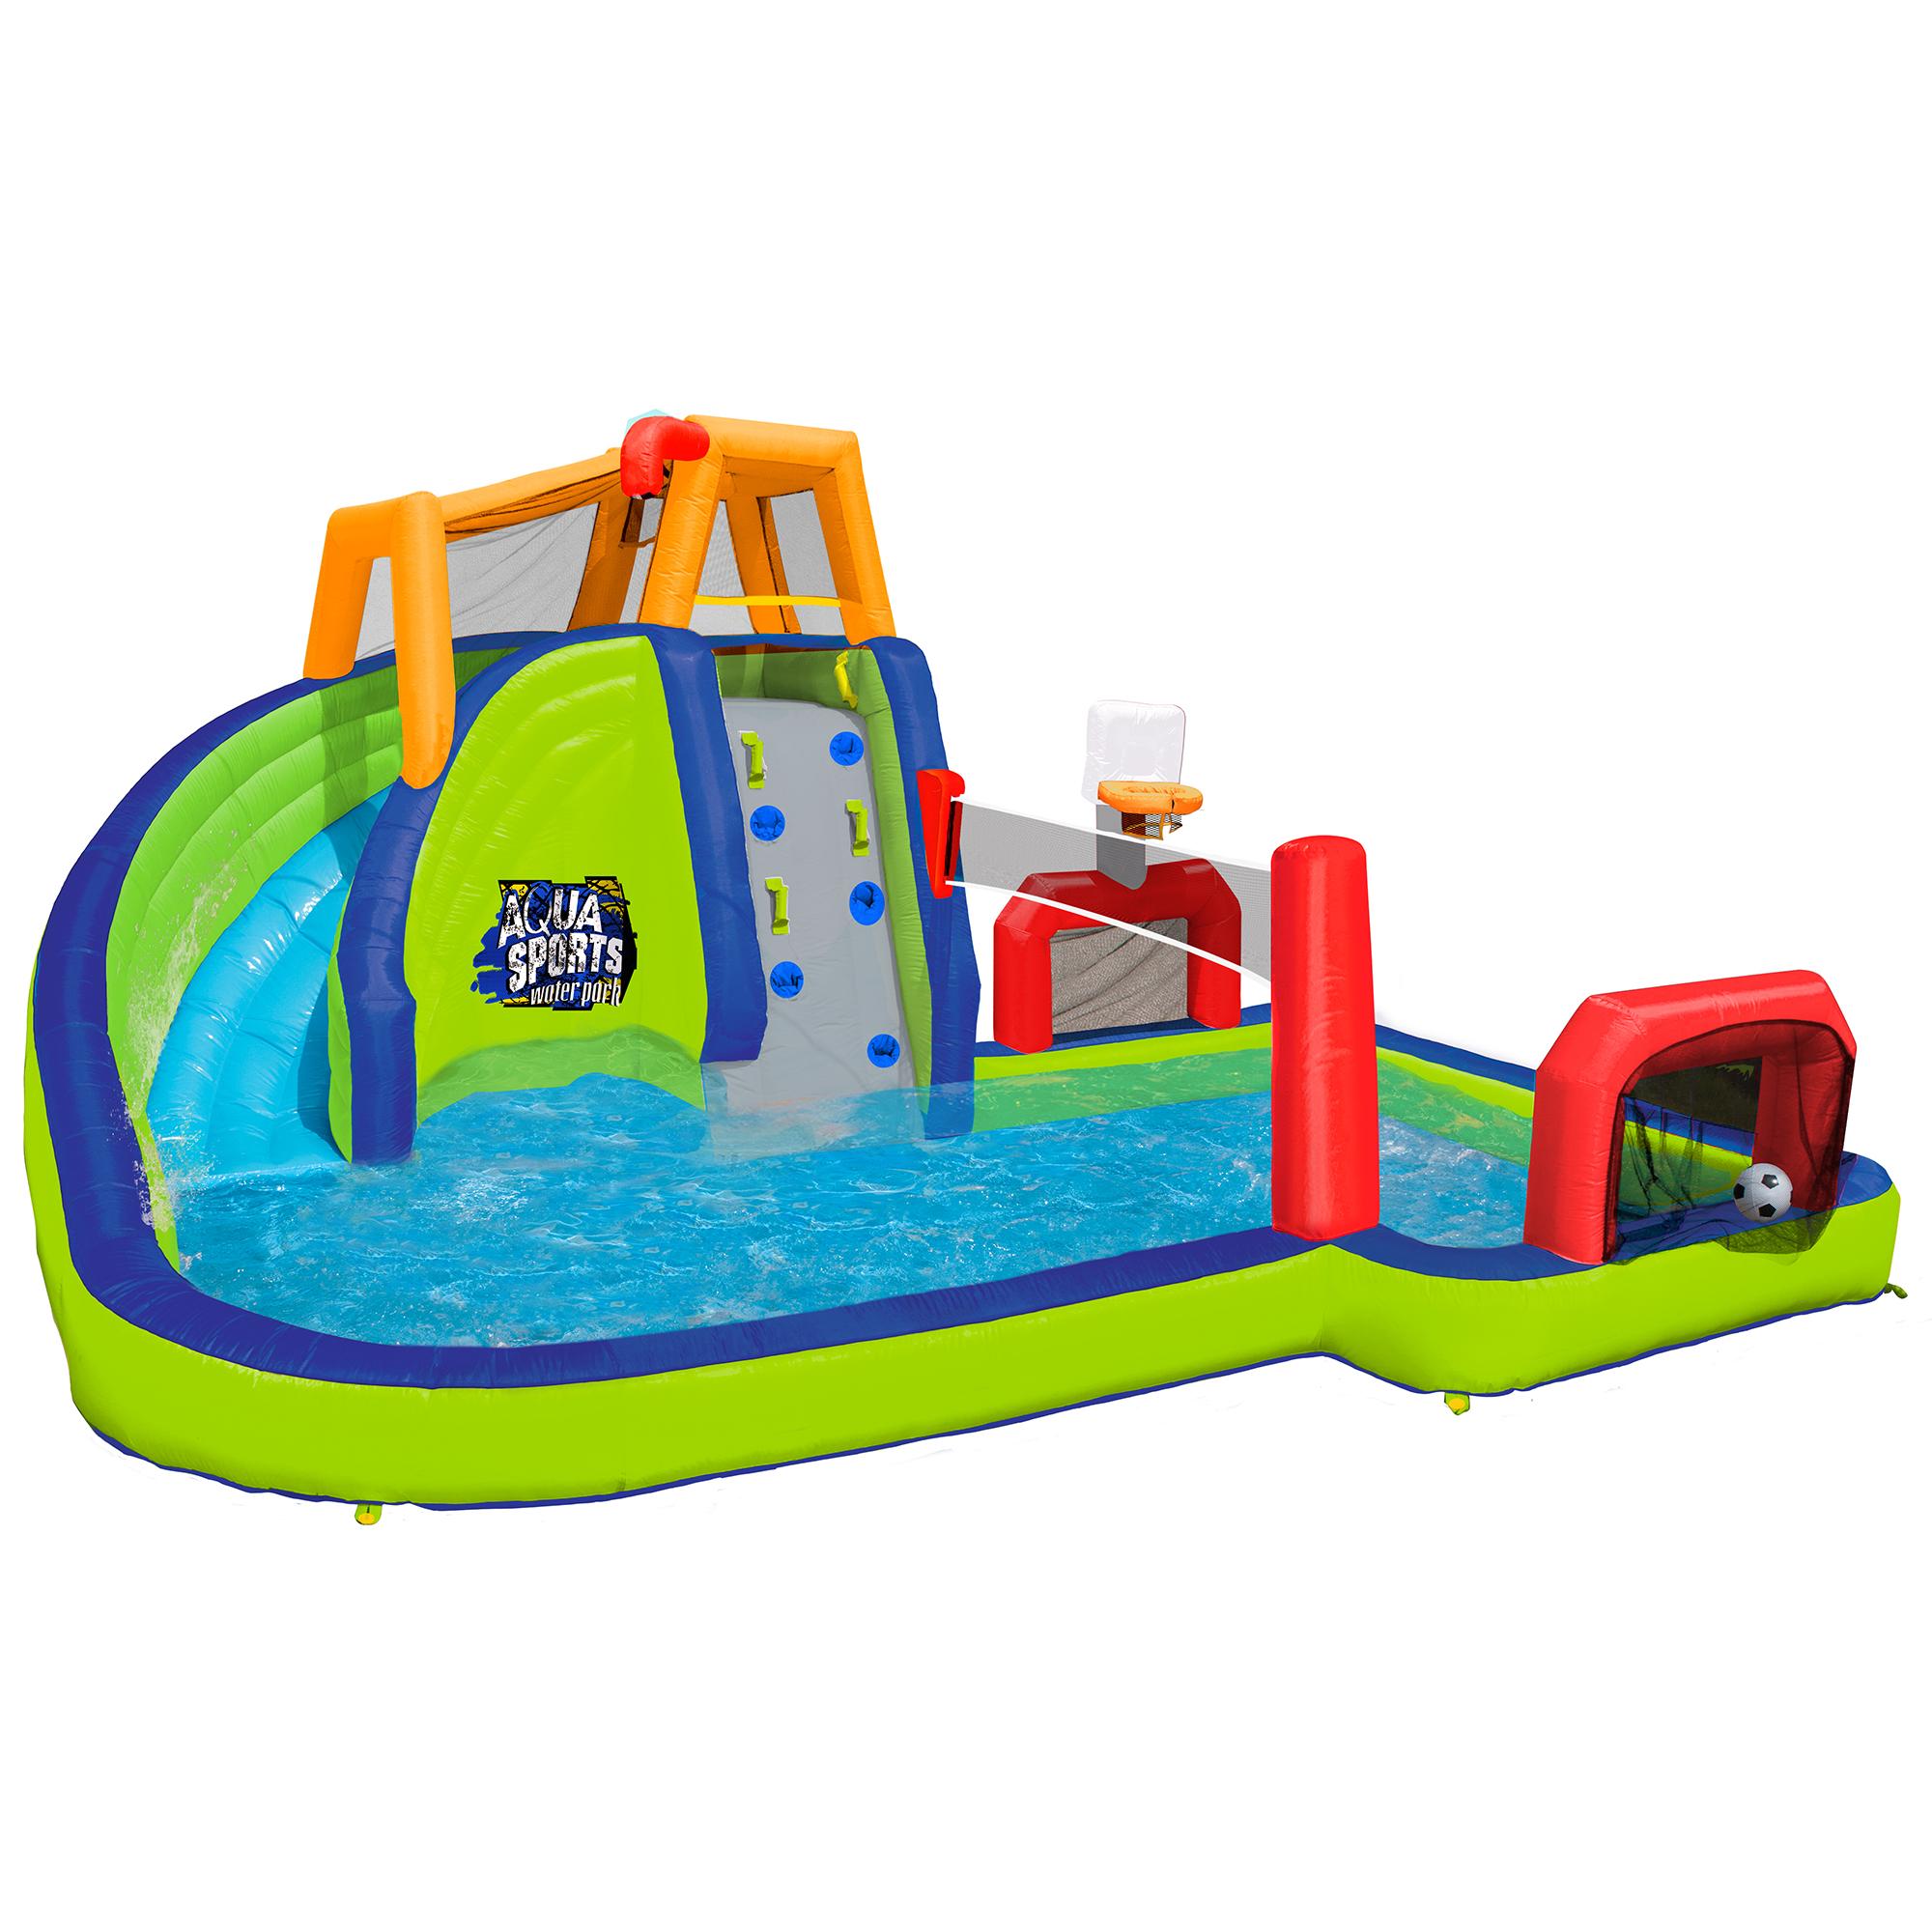 Inflatable Water Slides Llc: Banzai Inflatable Aqua Sports Splash Kiddie Pool And Slide